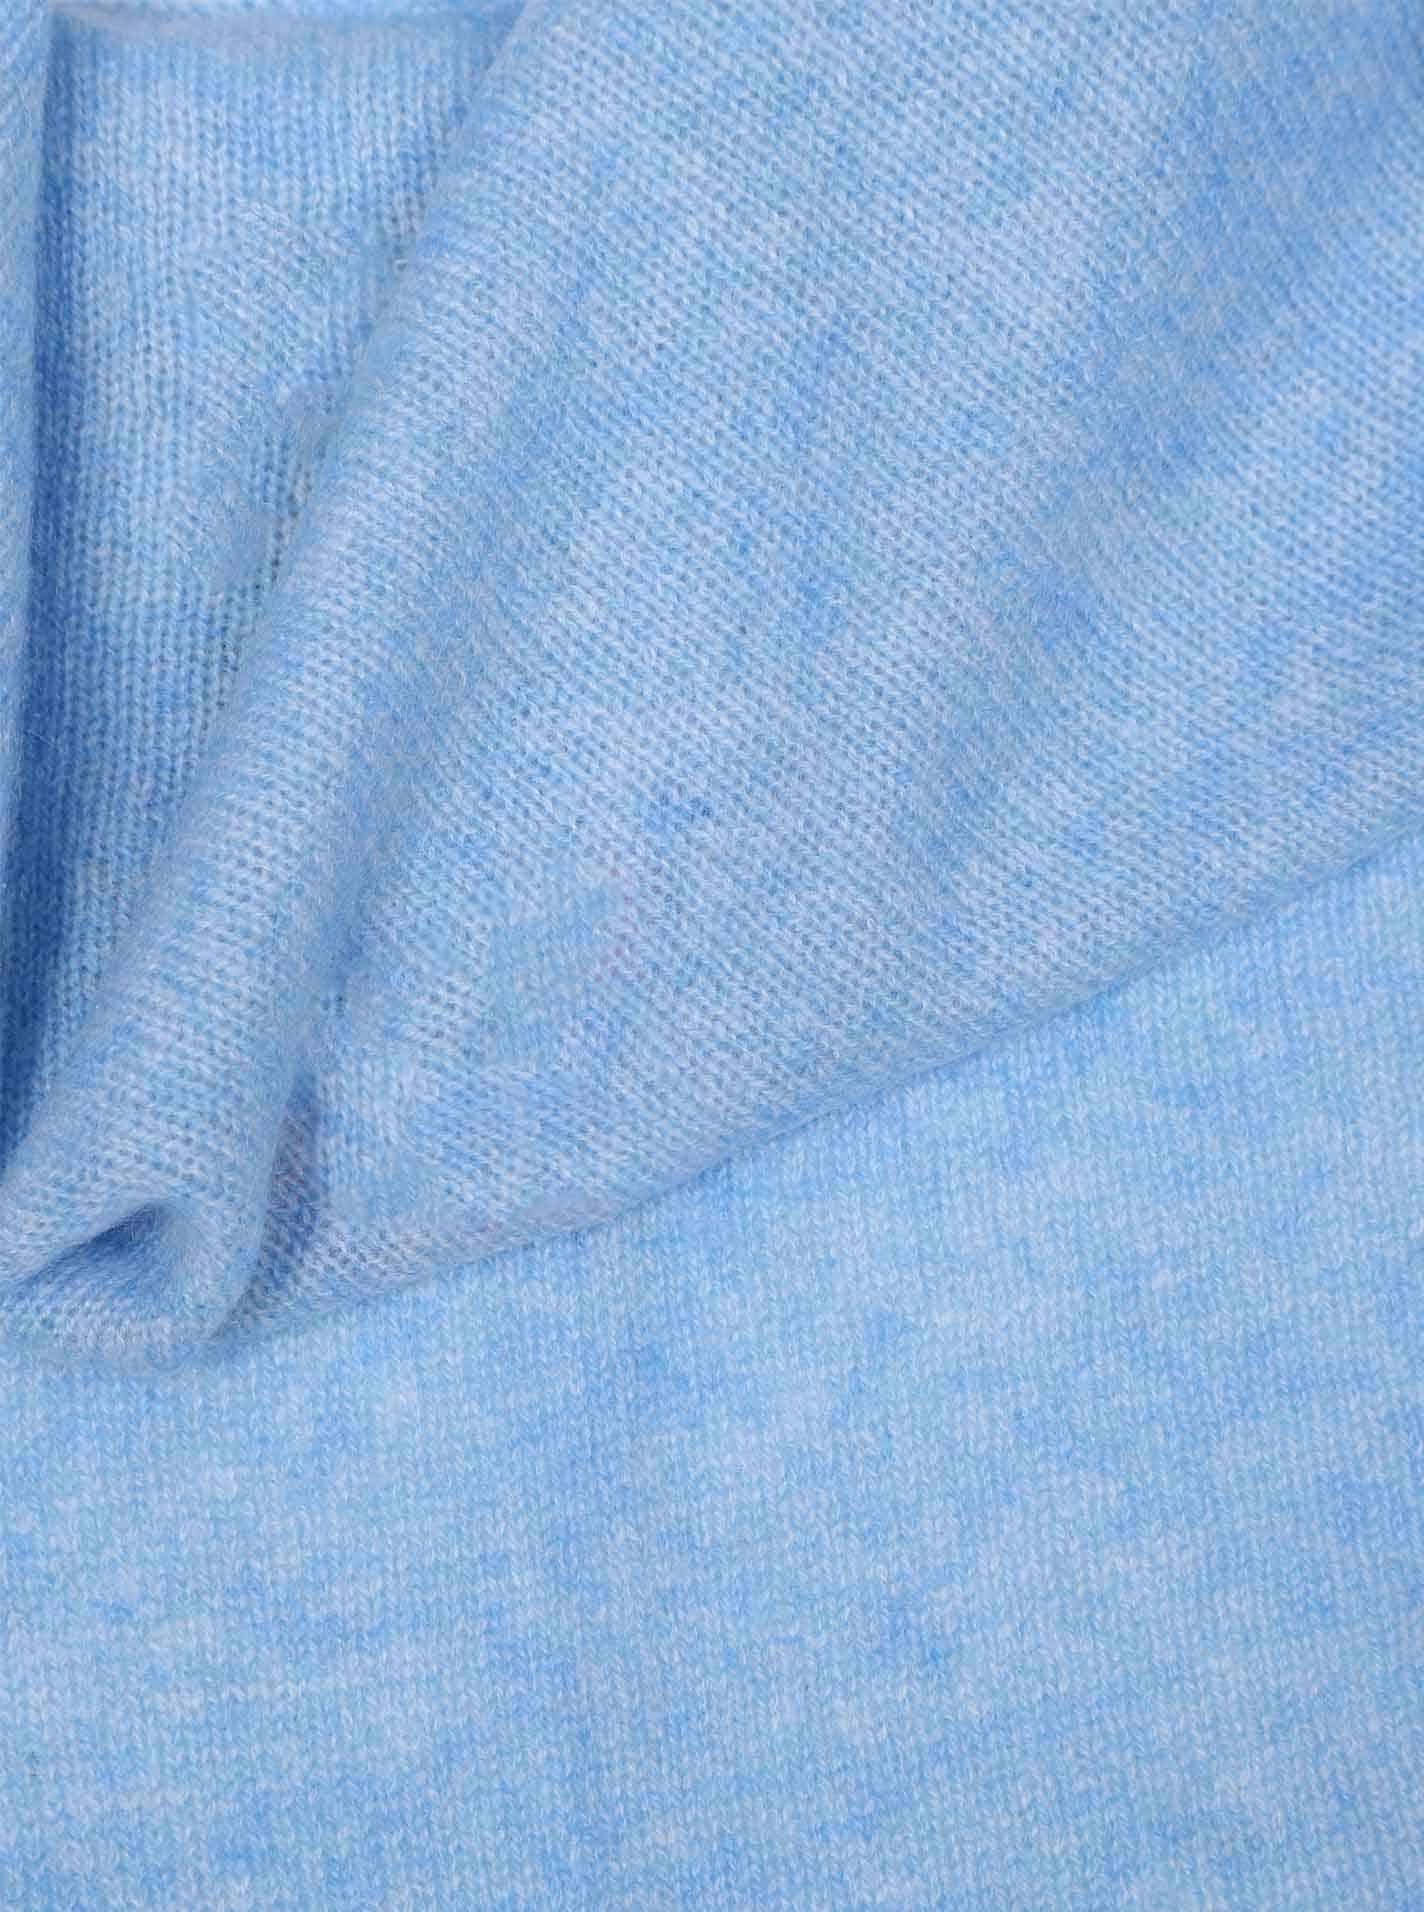 Dreieckstuch Cashmere Hellblau